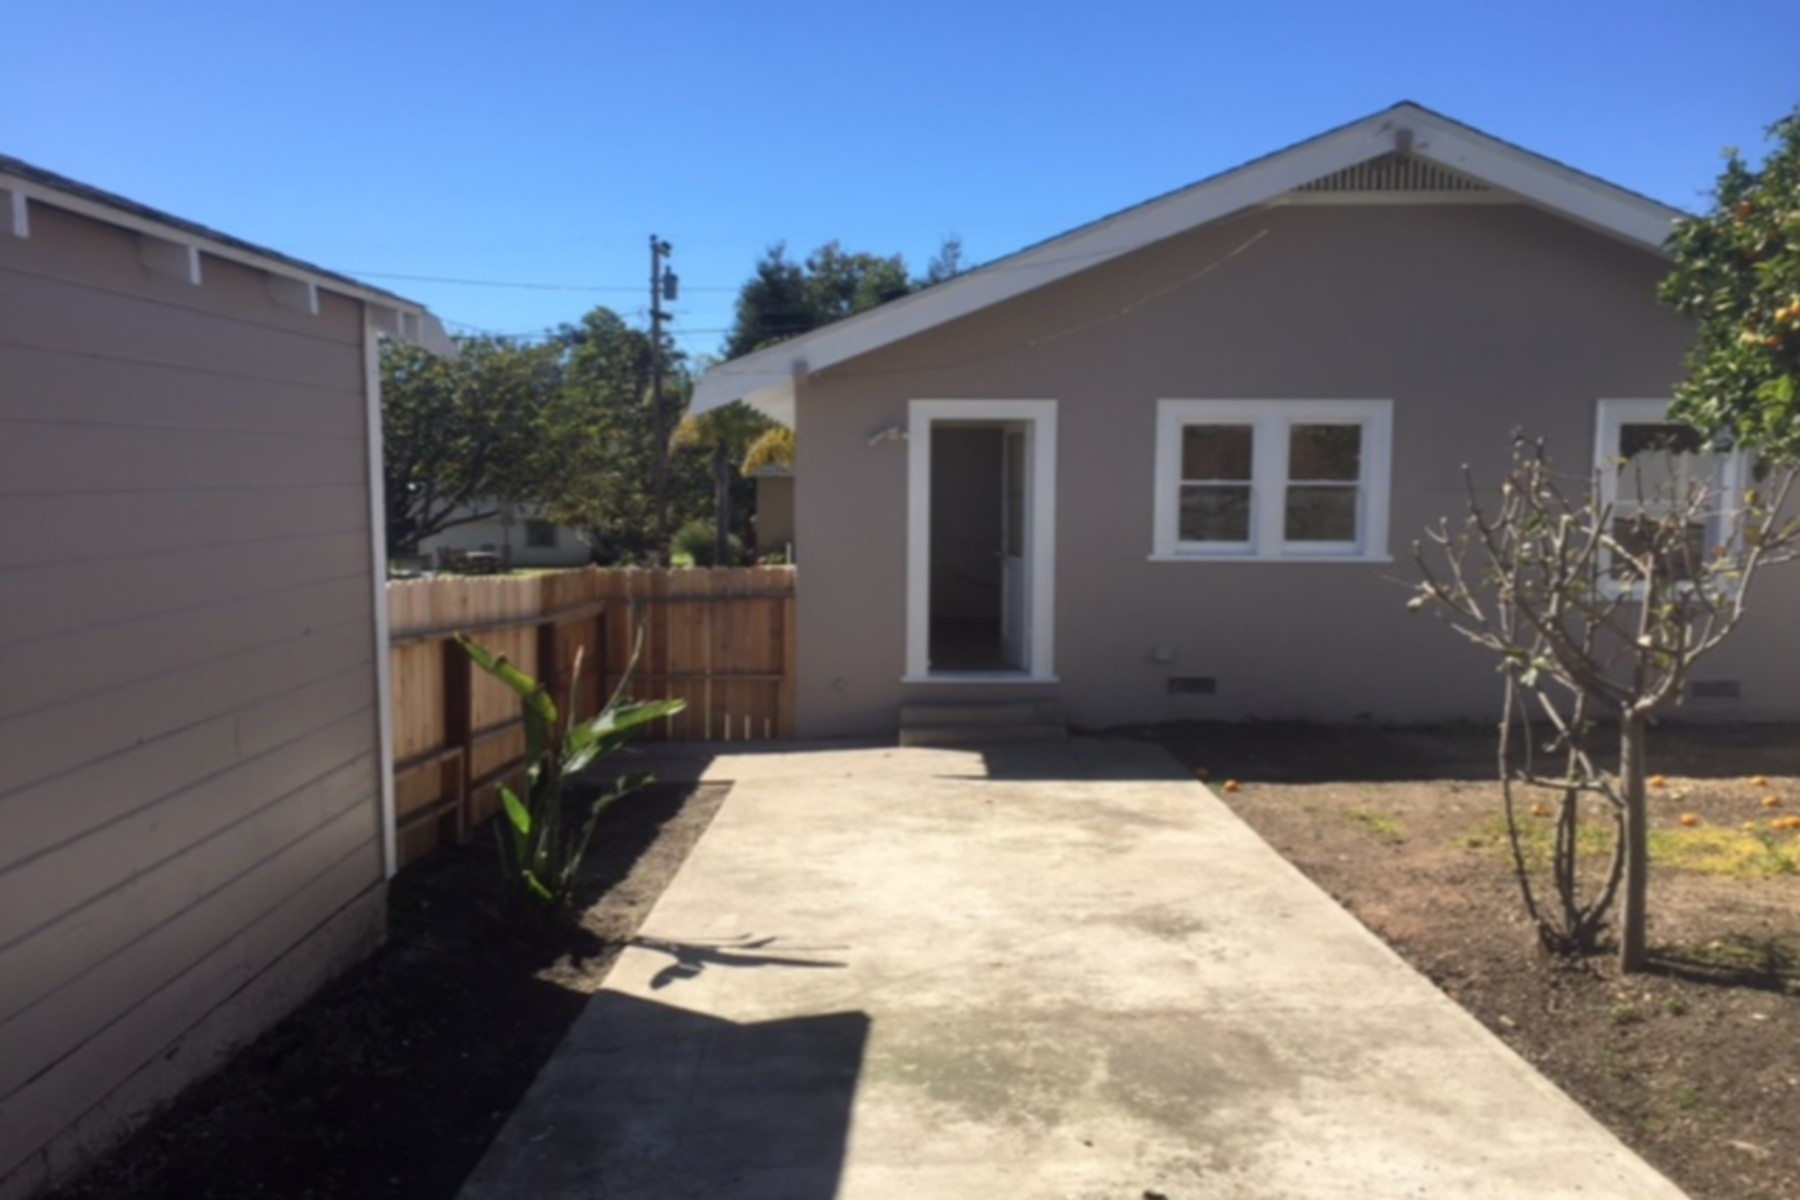 Single Family Home for Sale at 1350 Bello, Pismo Beach Pismo Beach, California, 93449 United States